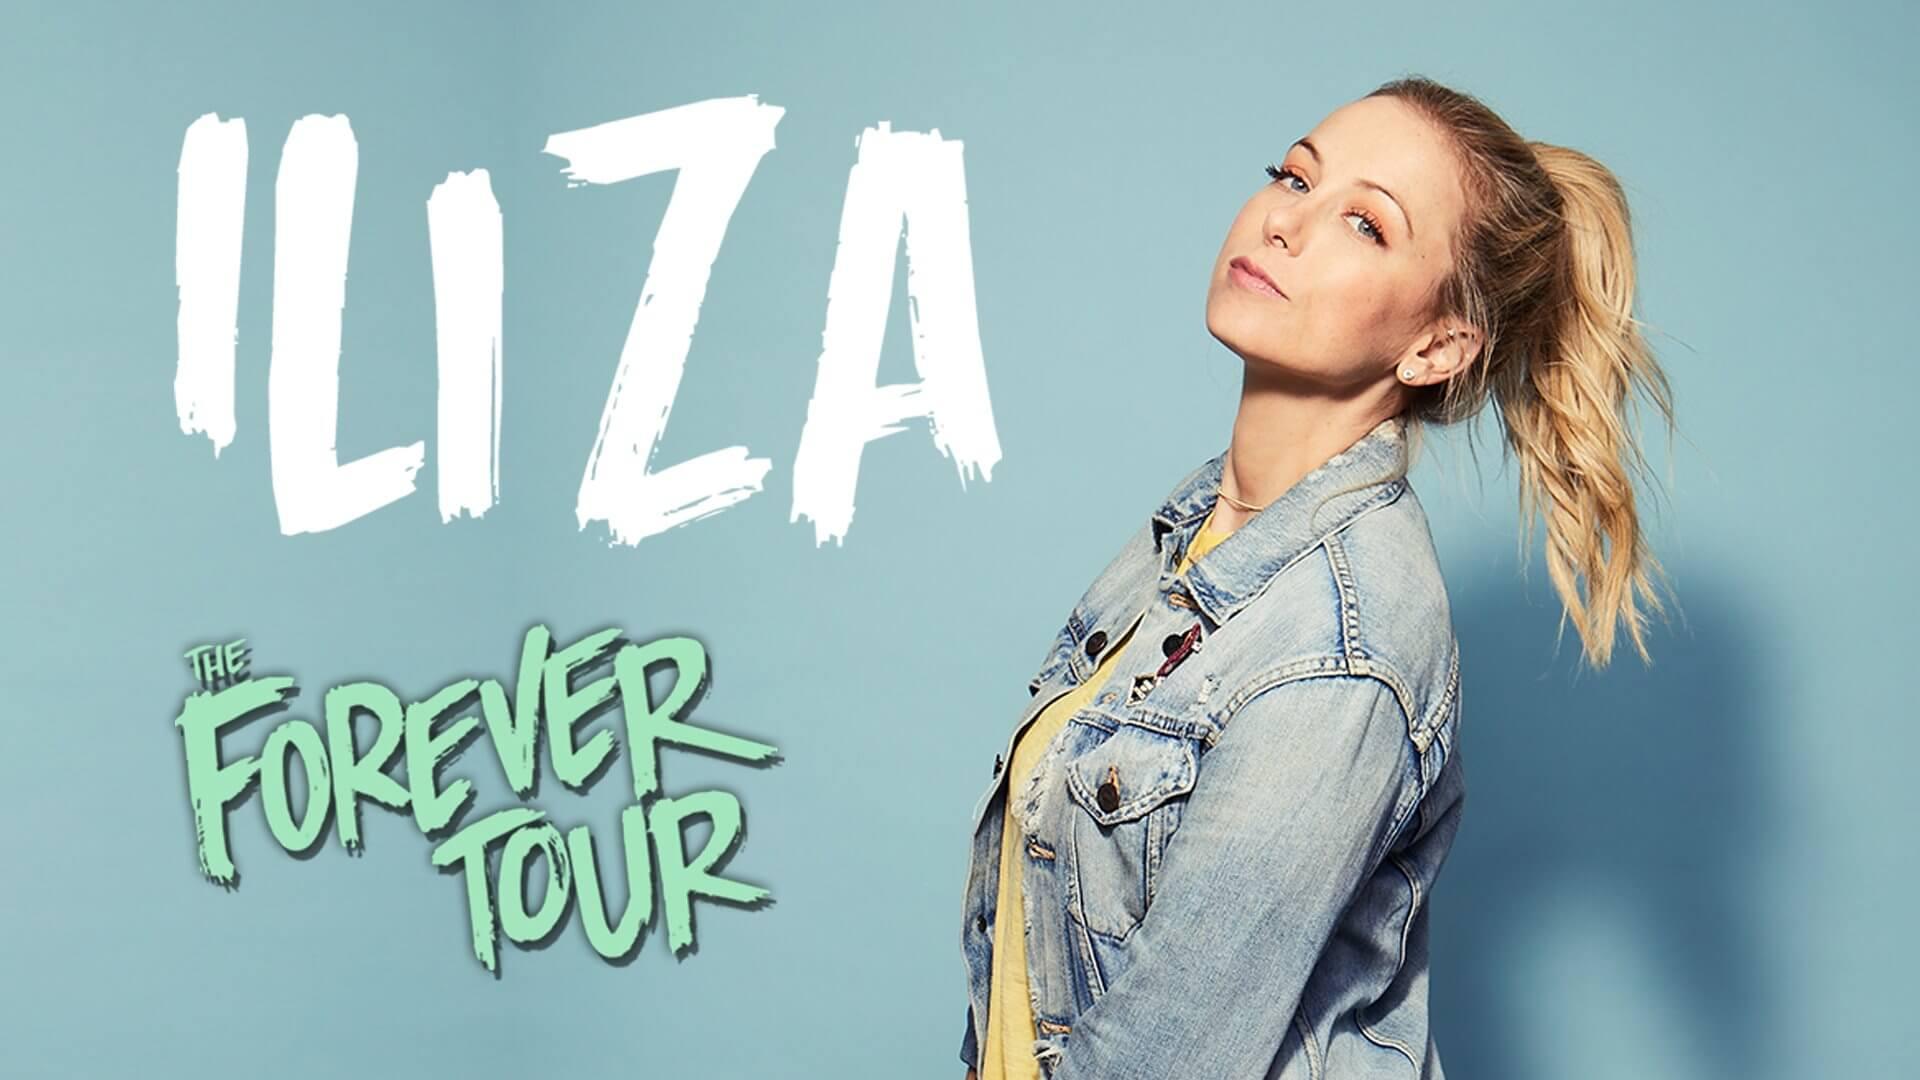 Iliza | The Forever Tour